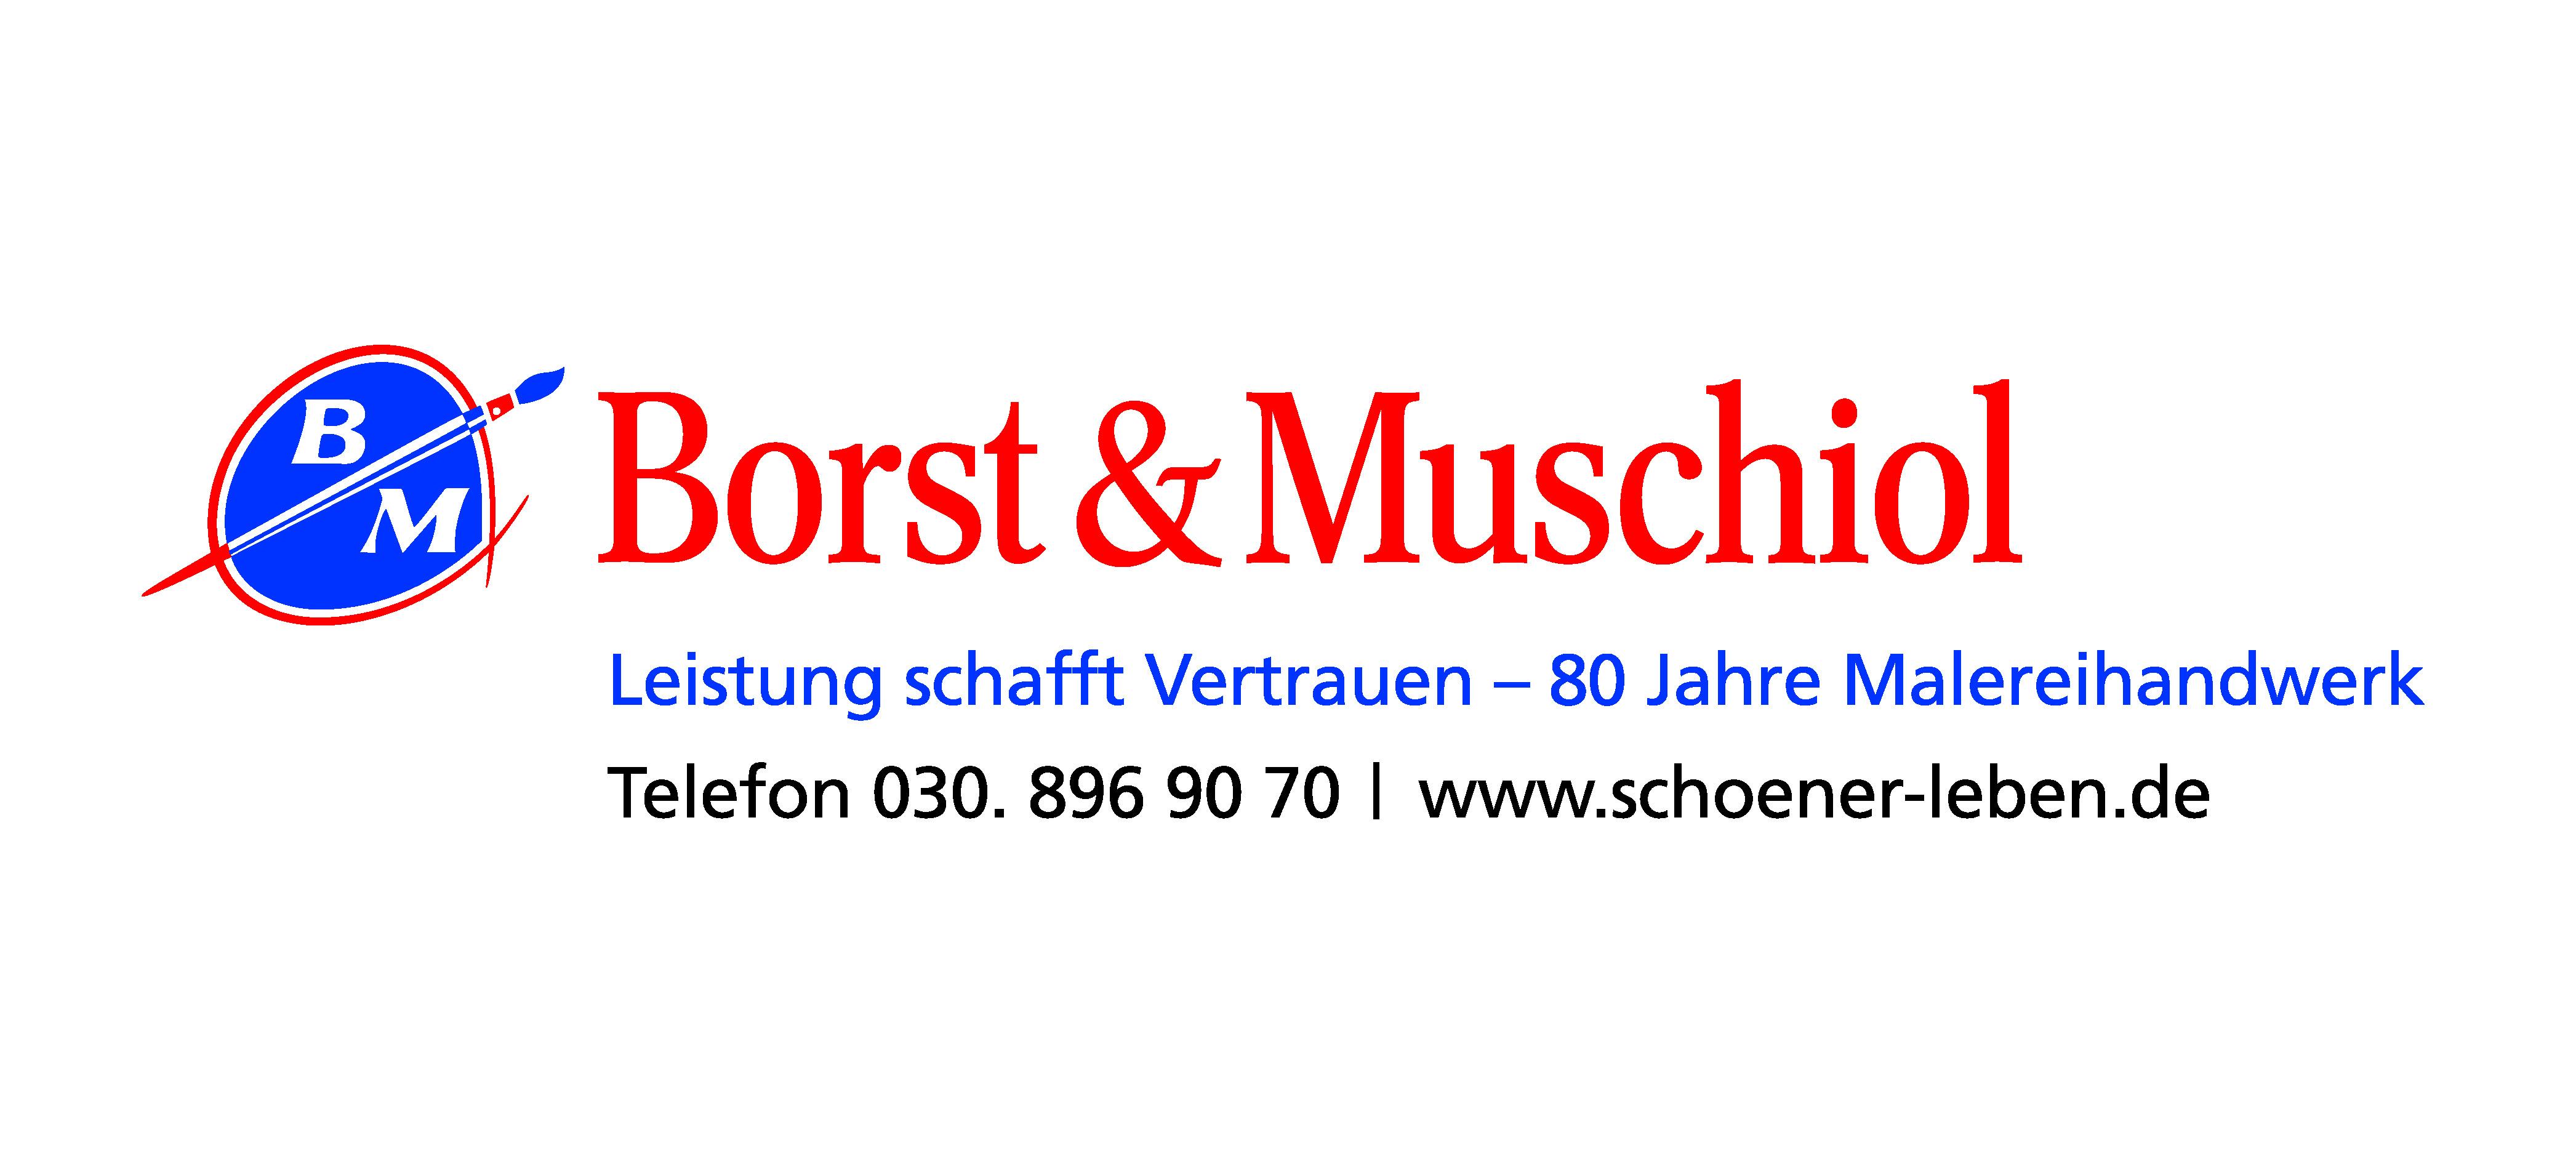 Borst & Muschiol Malereibetrieb